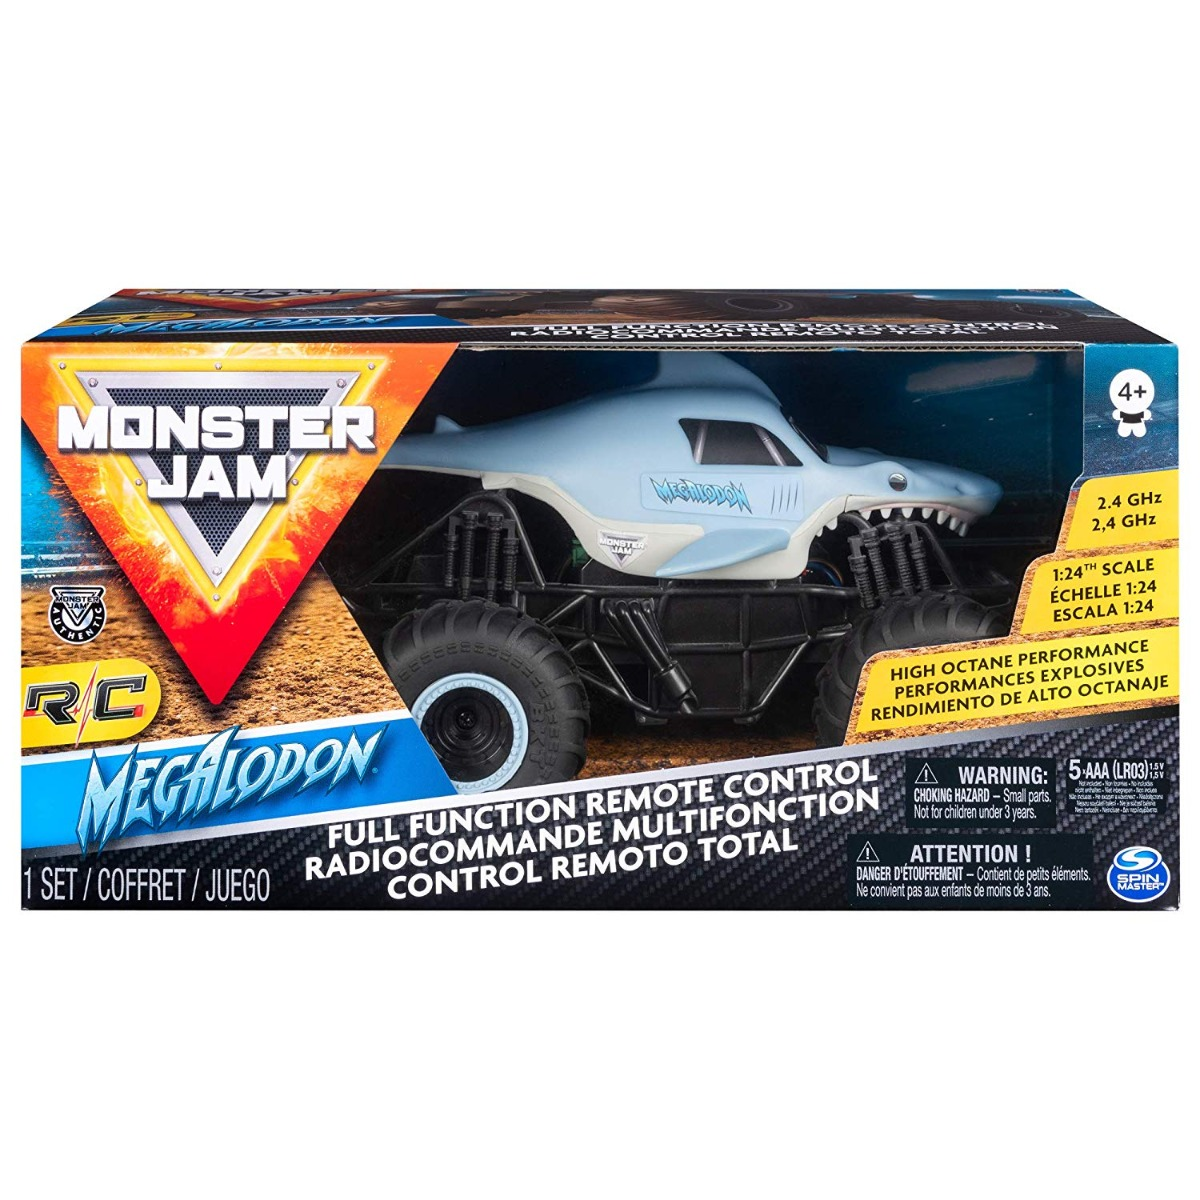 Masinuta cu telecomanda Monster Jam, Megalodon, 1:24